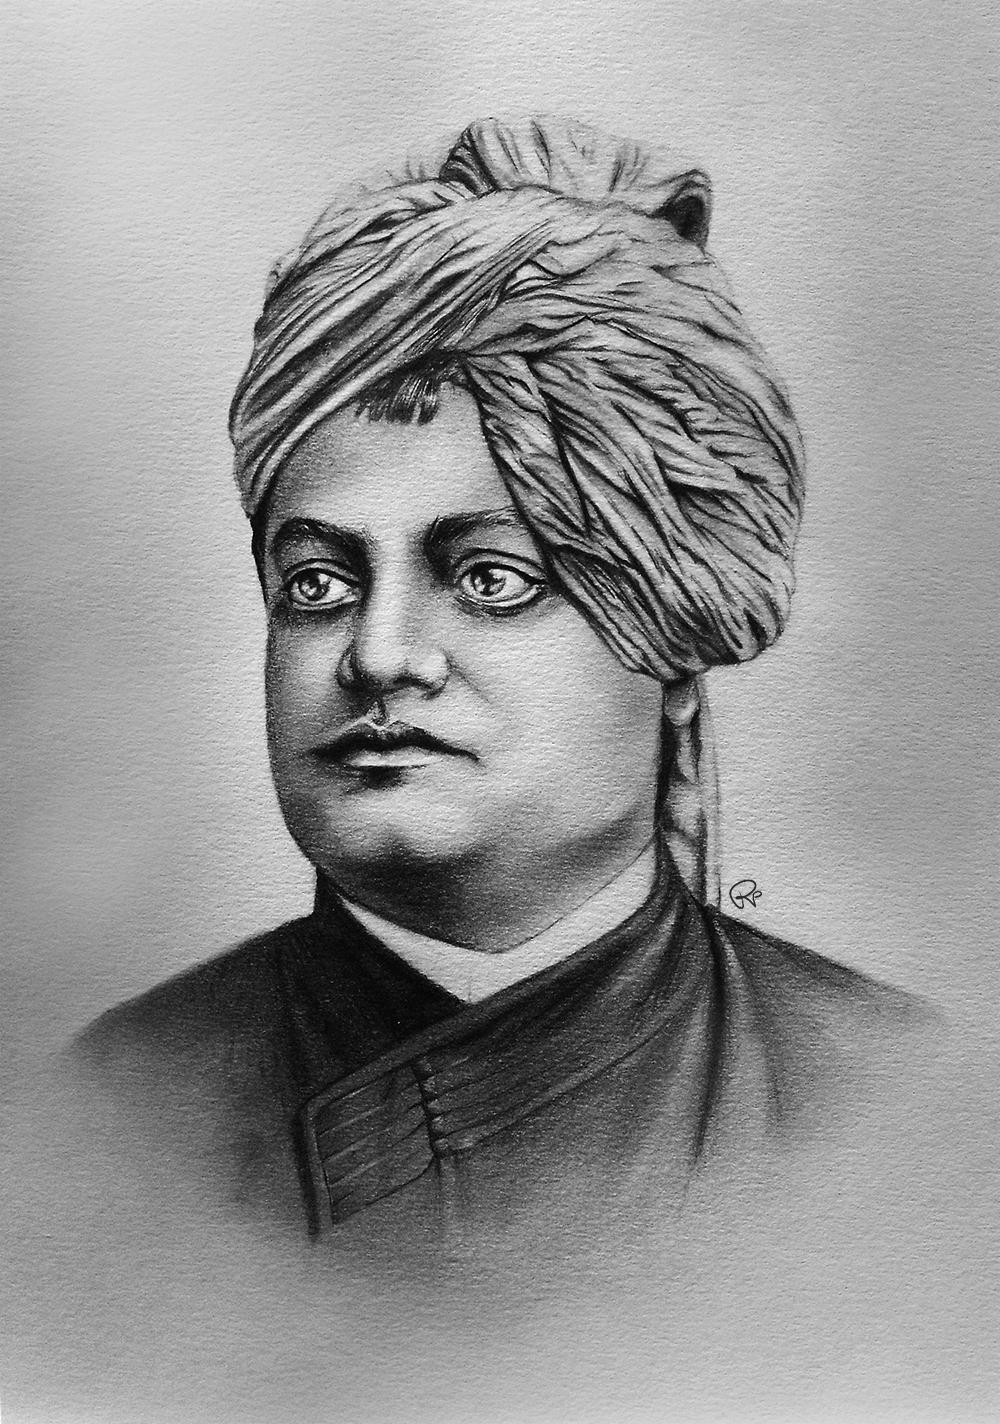 Swami Vivekananda by SparklingR on DeviantArt